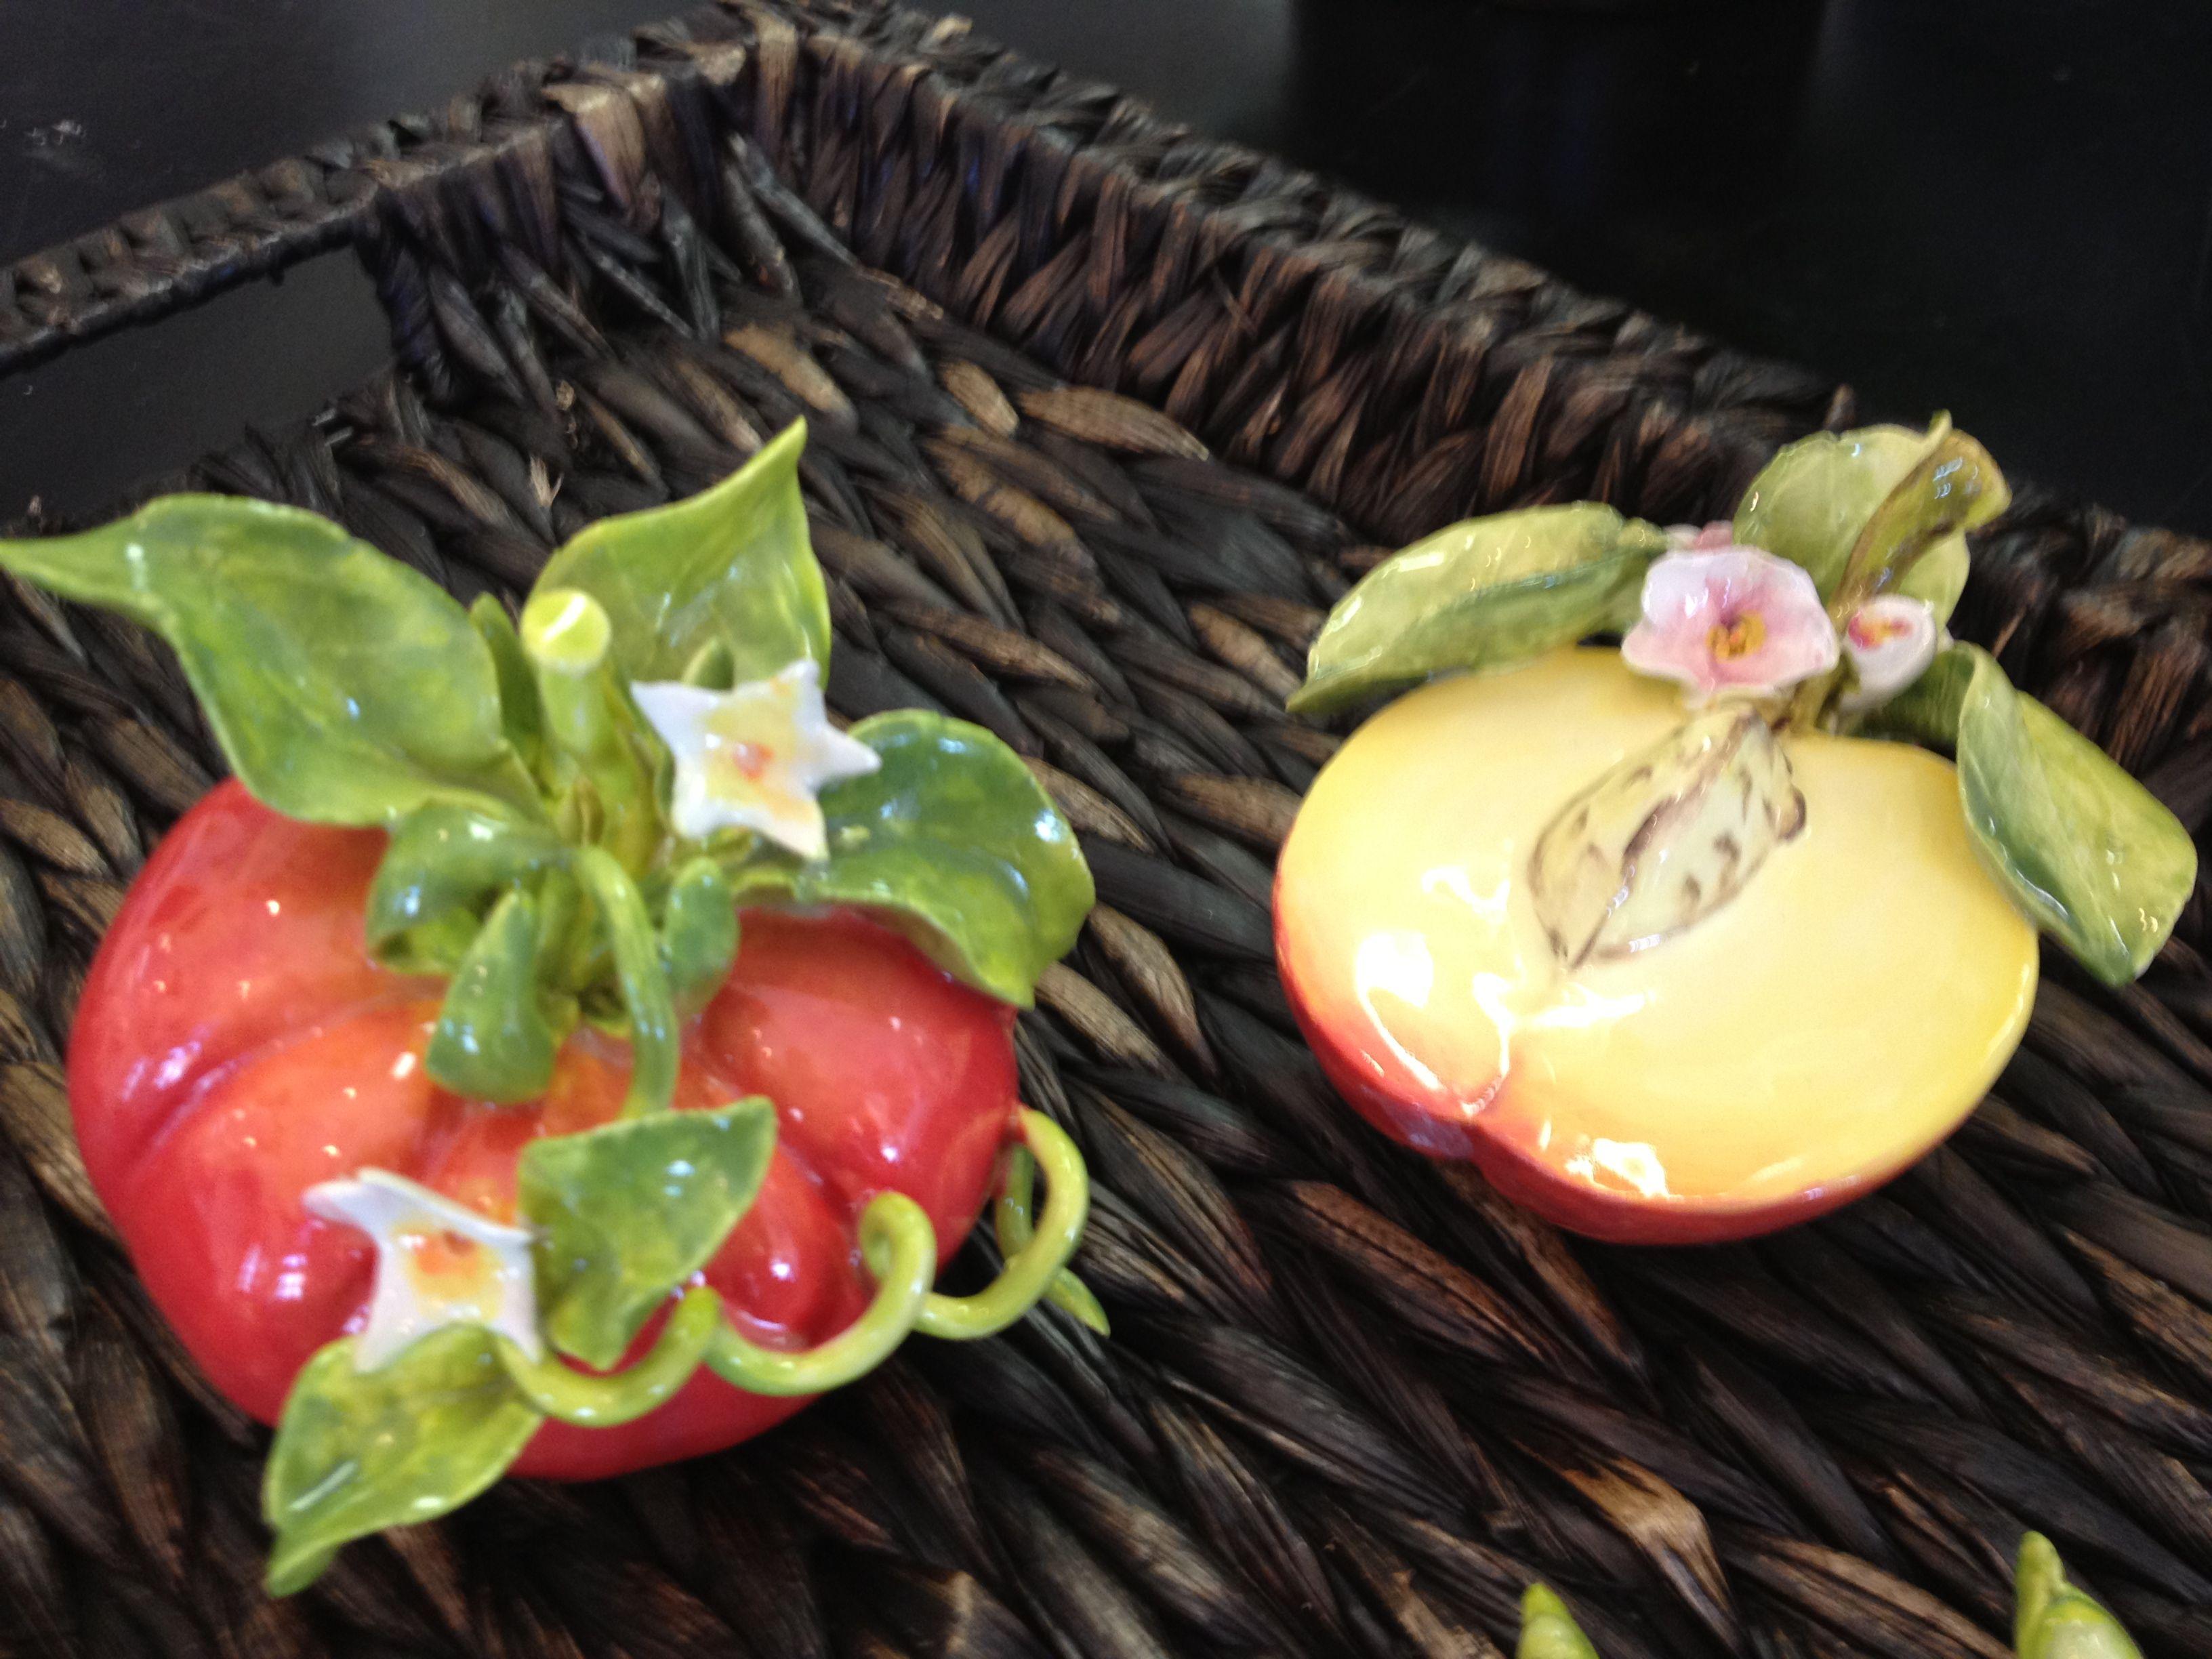 Eva Gordon Tomato With Blossom Half Peach With Blossom Beautiful